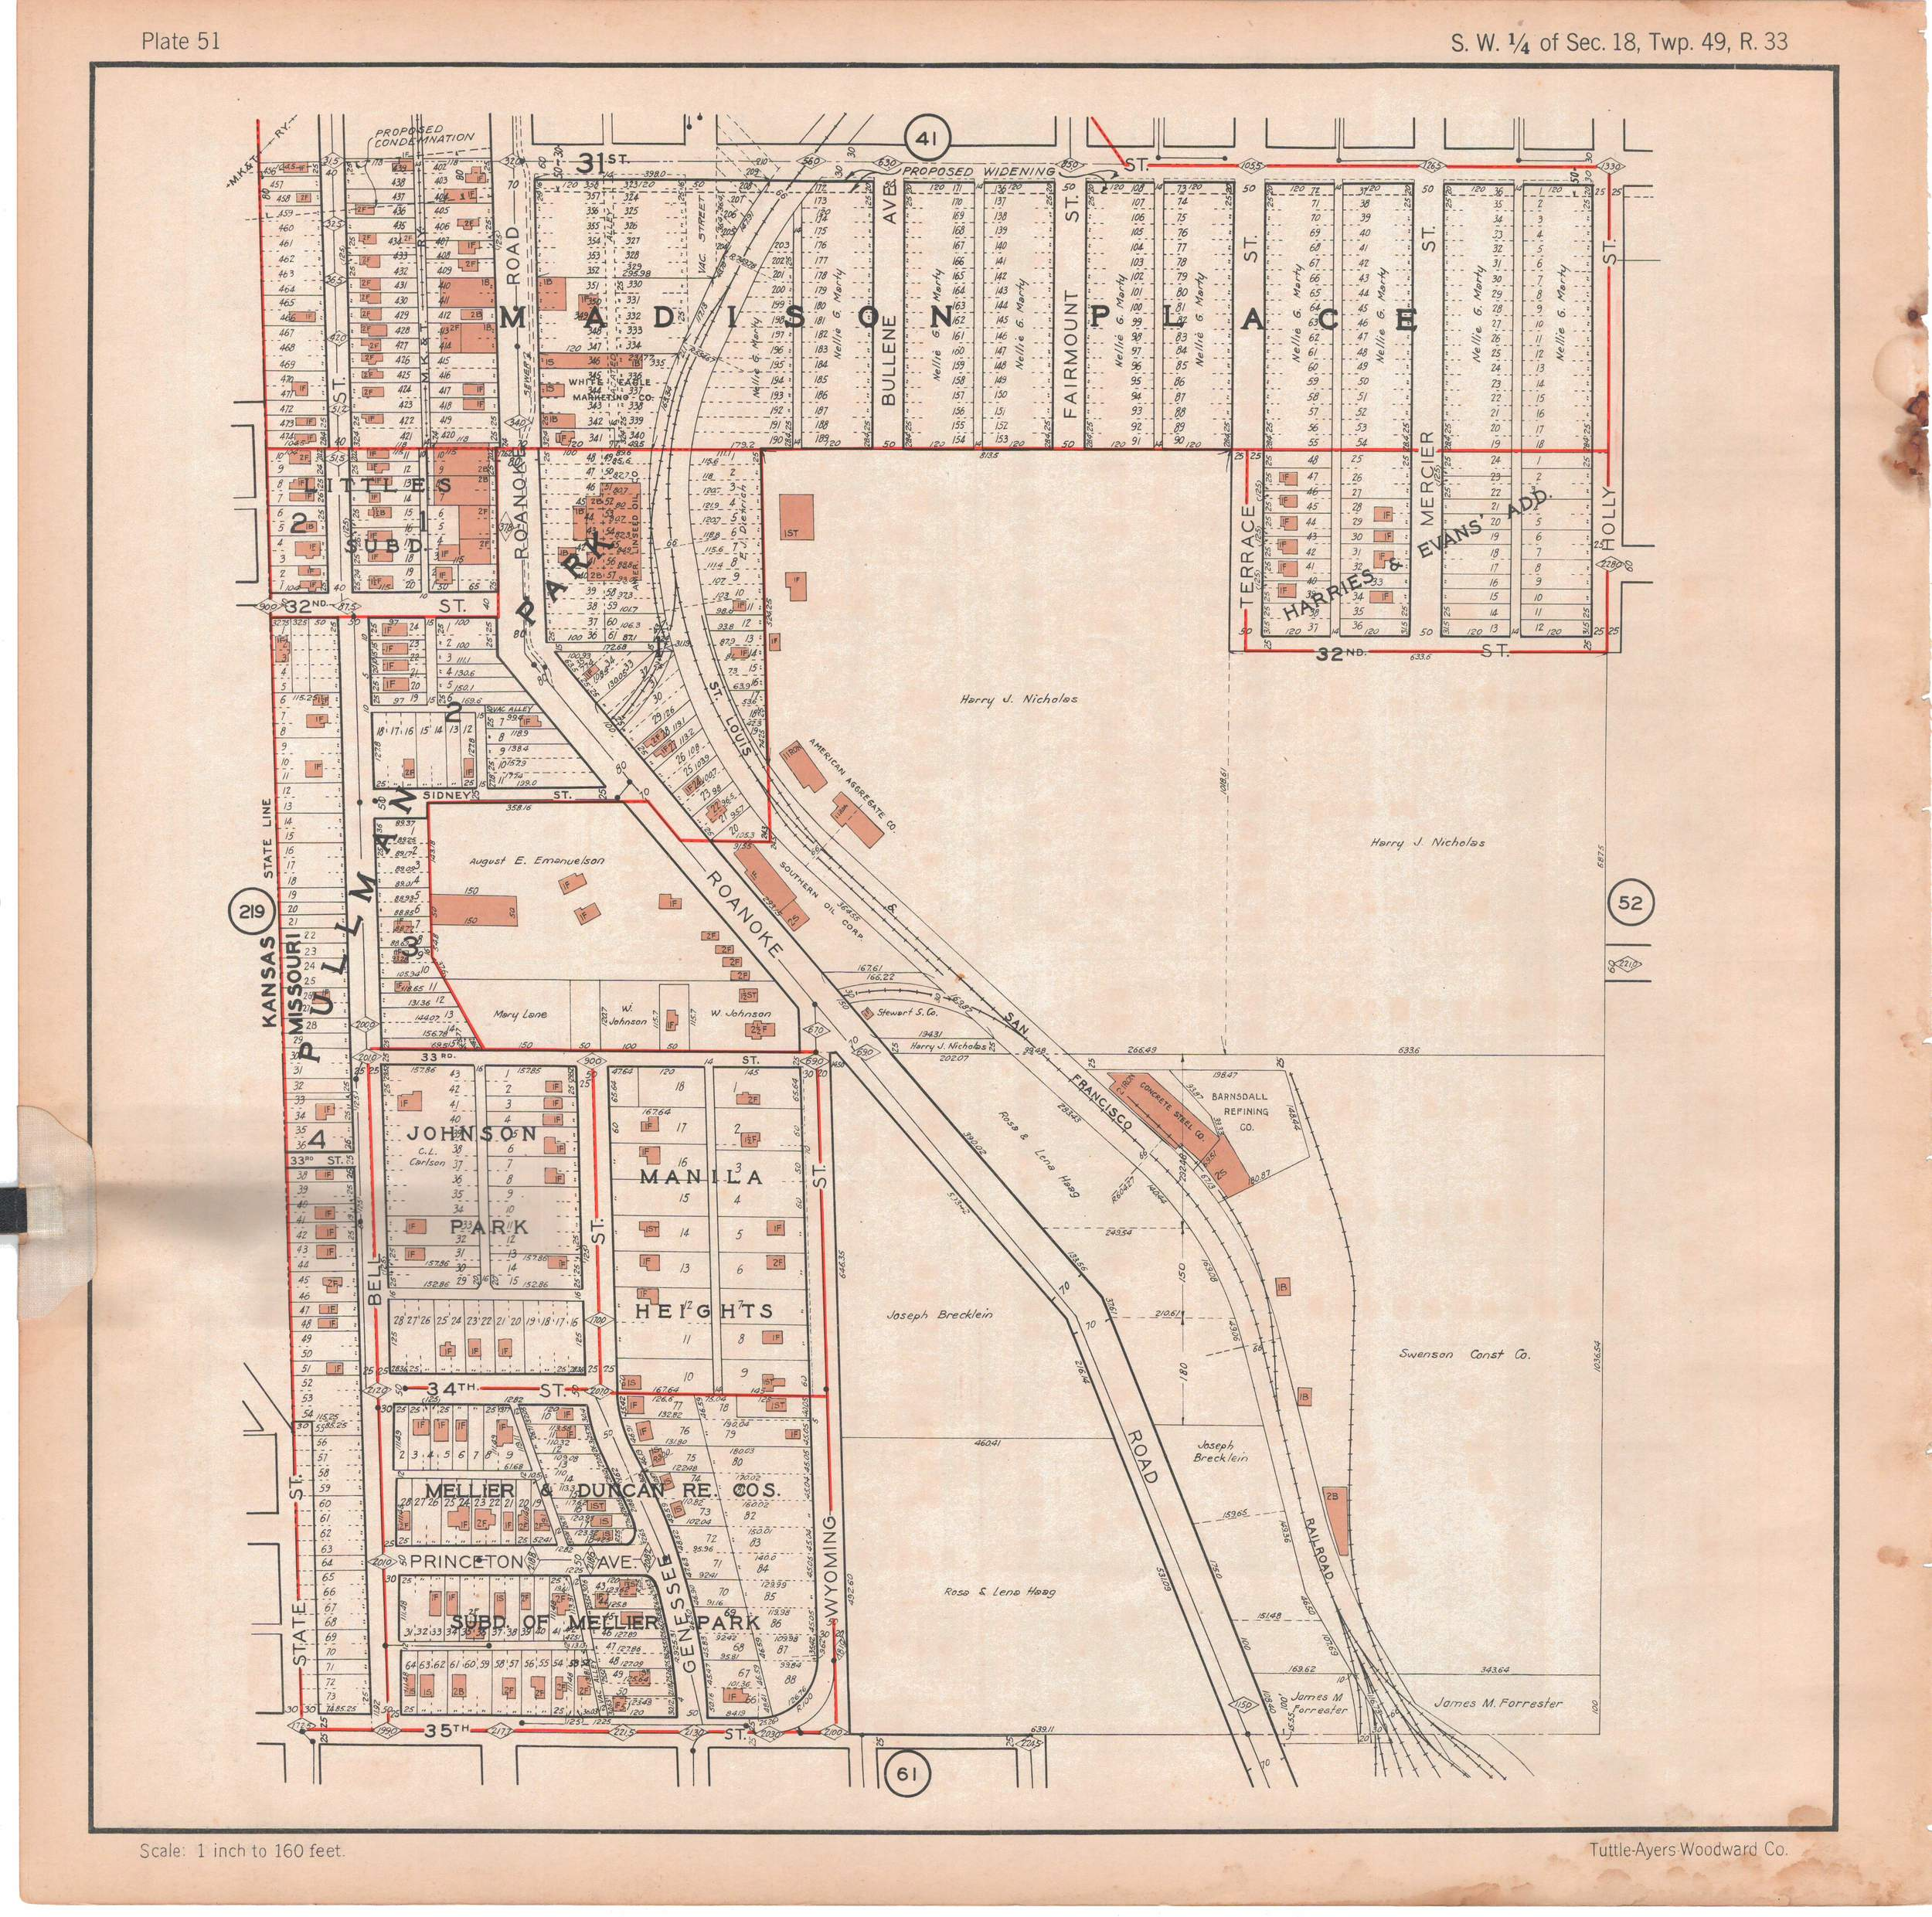 1925 TUTTLE_AYERS_Plate 51.JPG